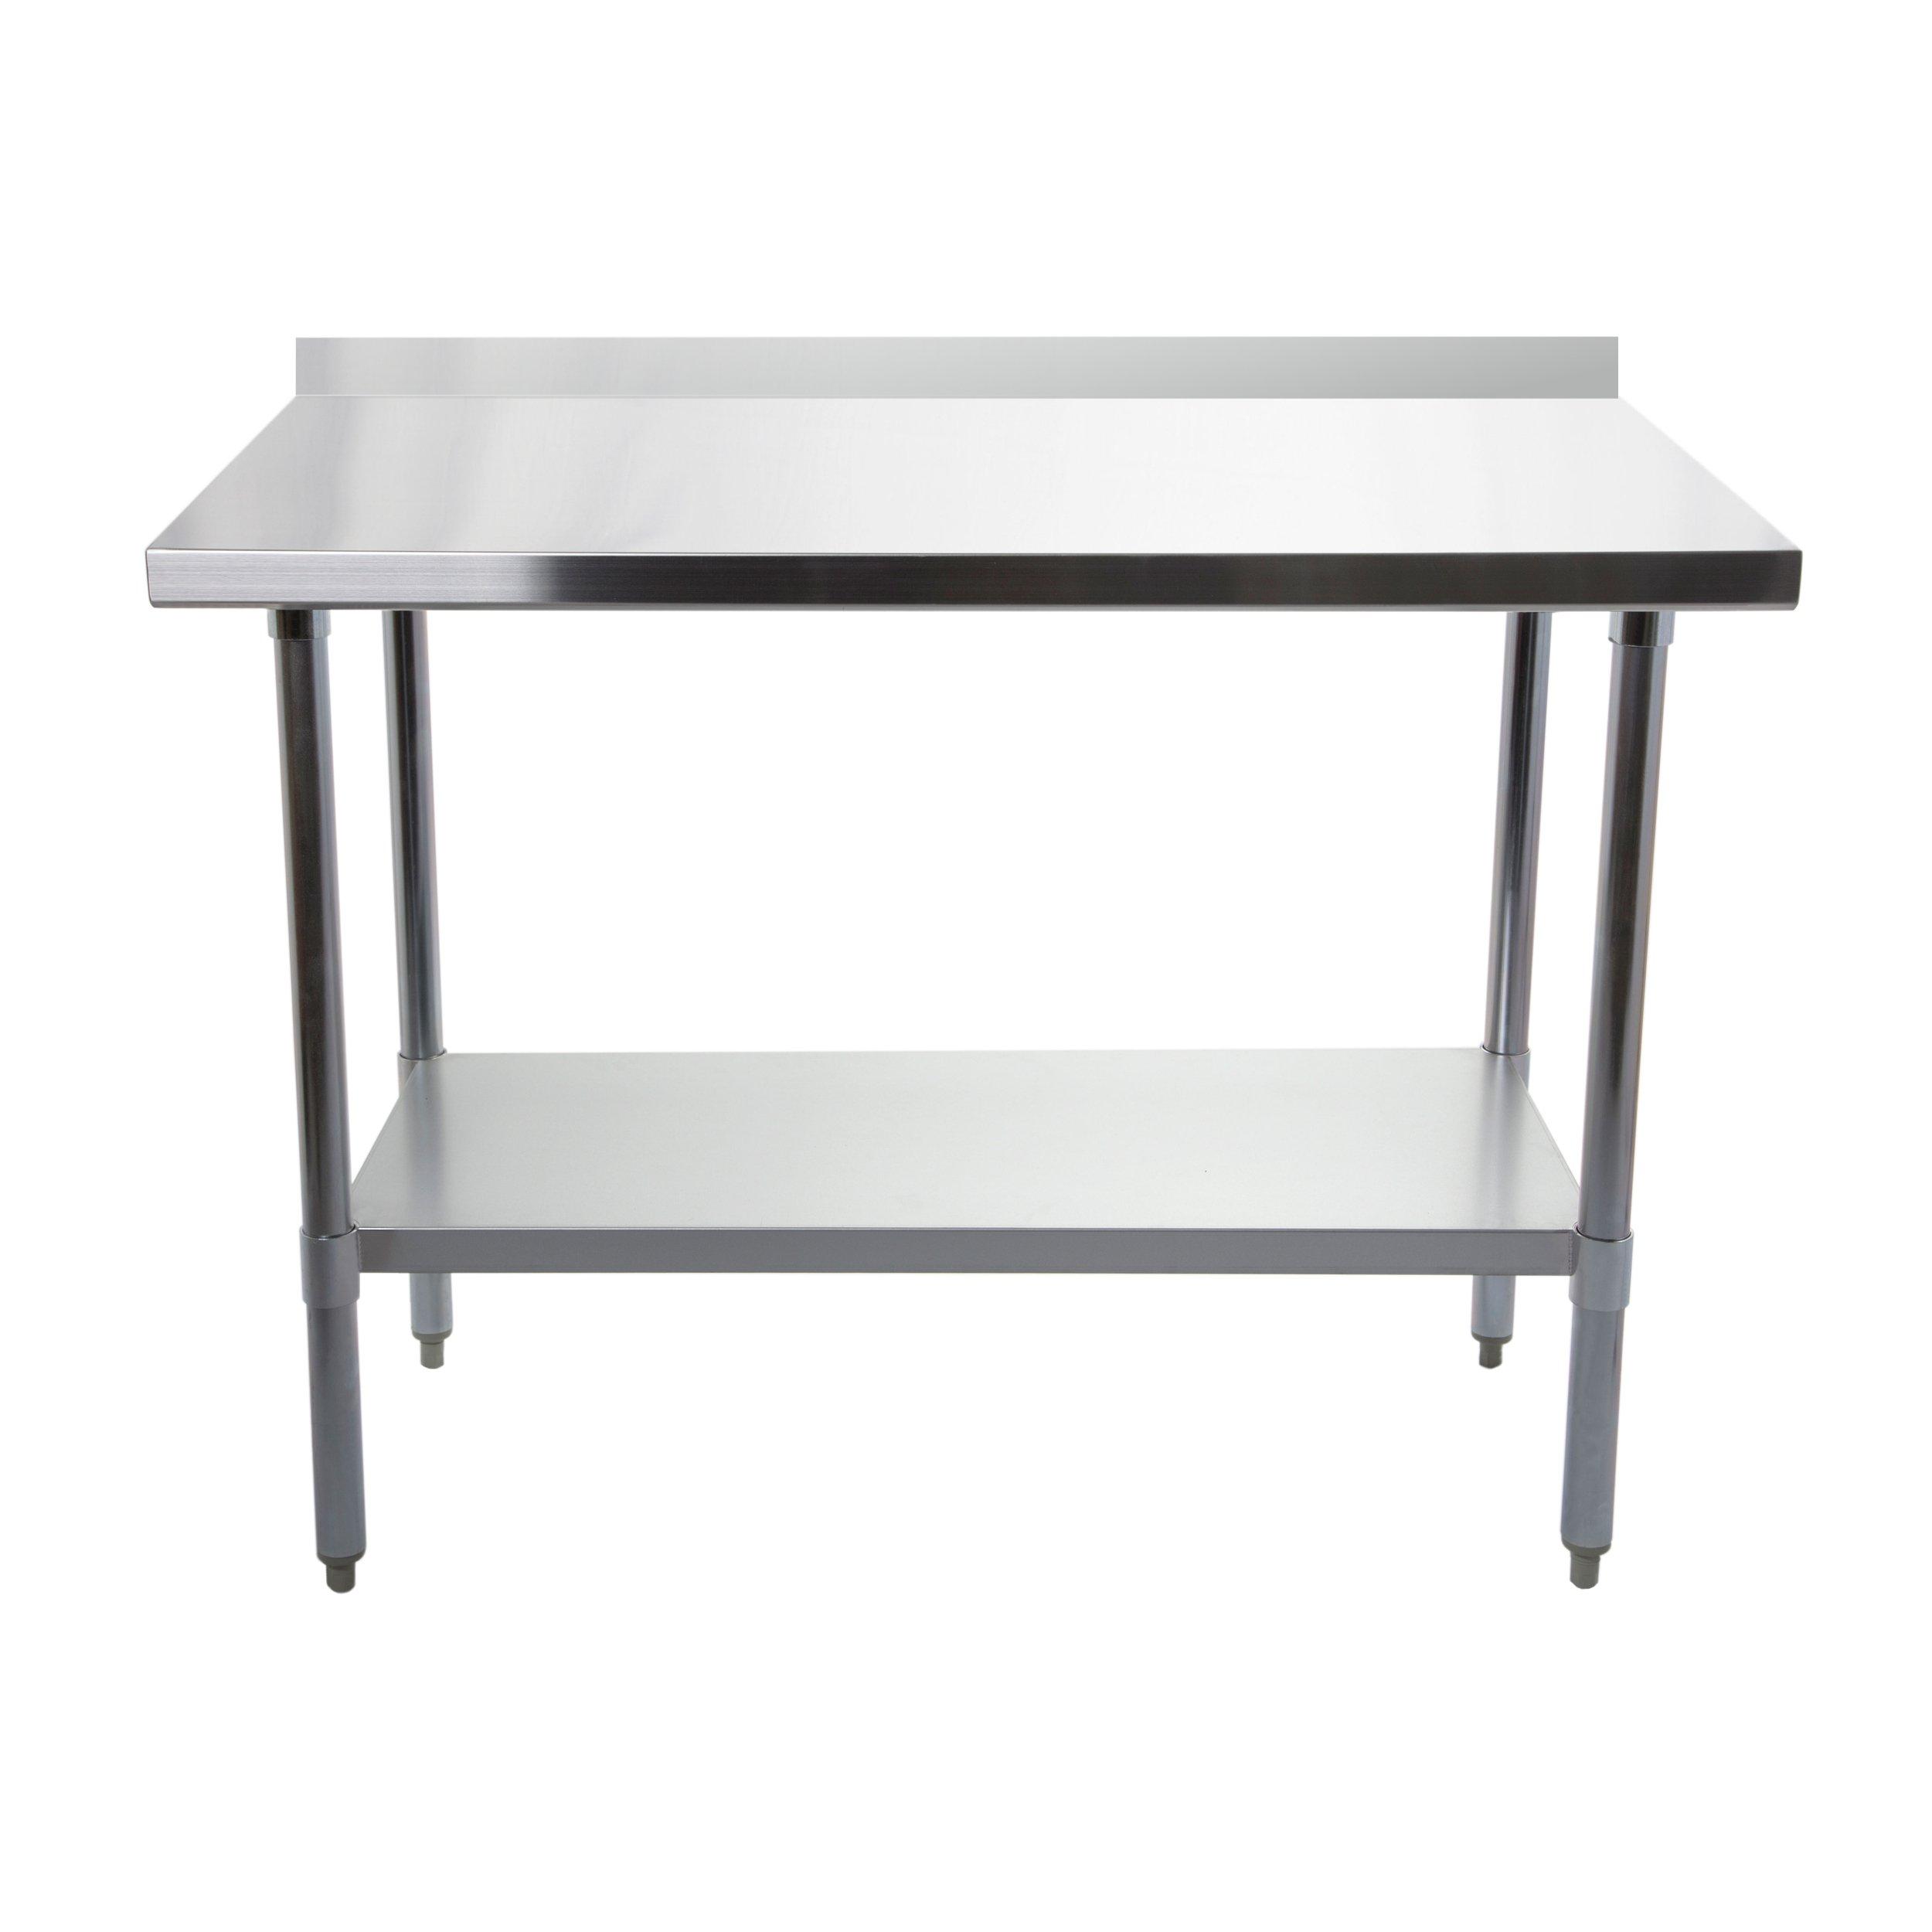 Pracovný stôl. Nerezová oceľ s regálom. 90 x 60 cm